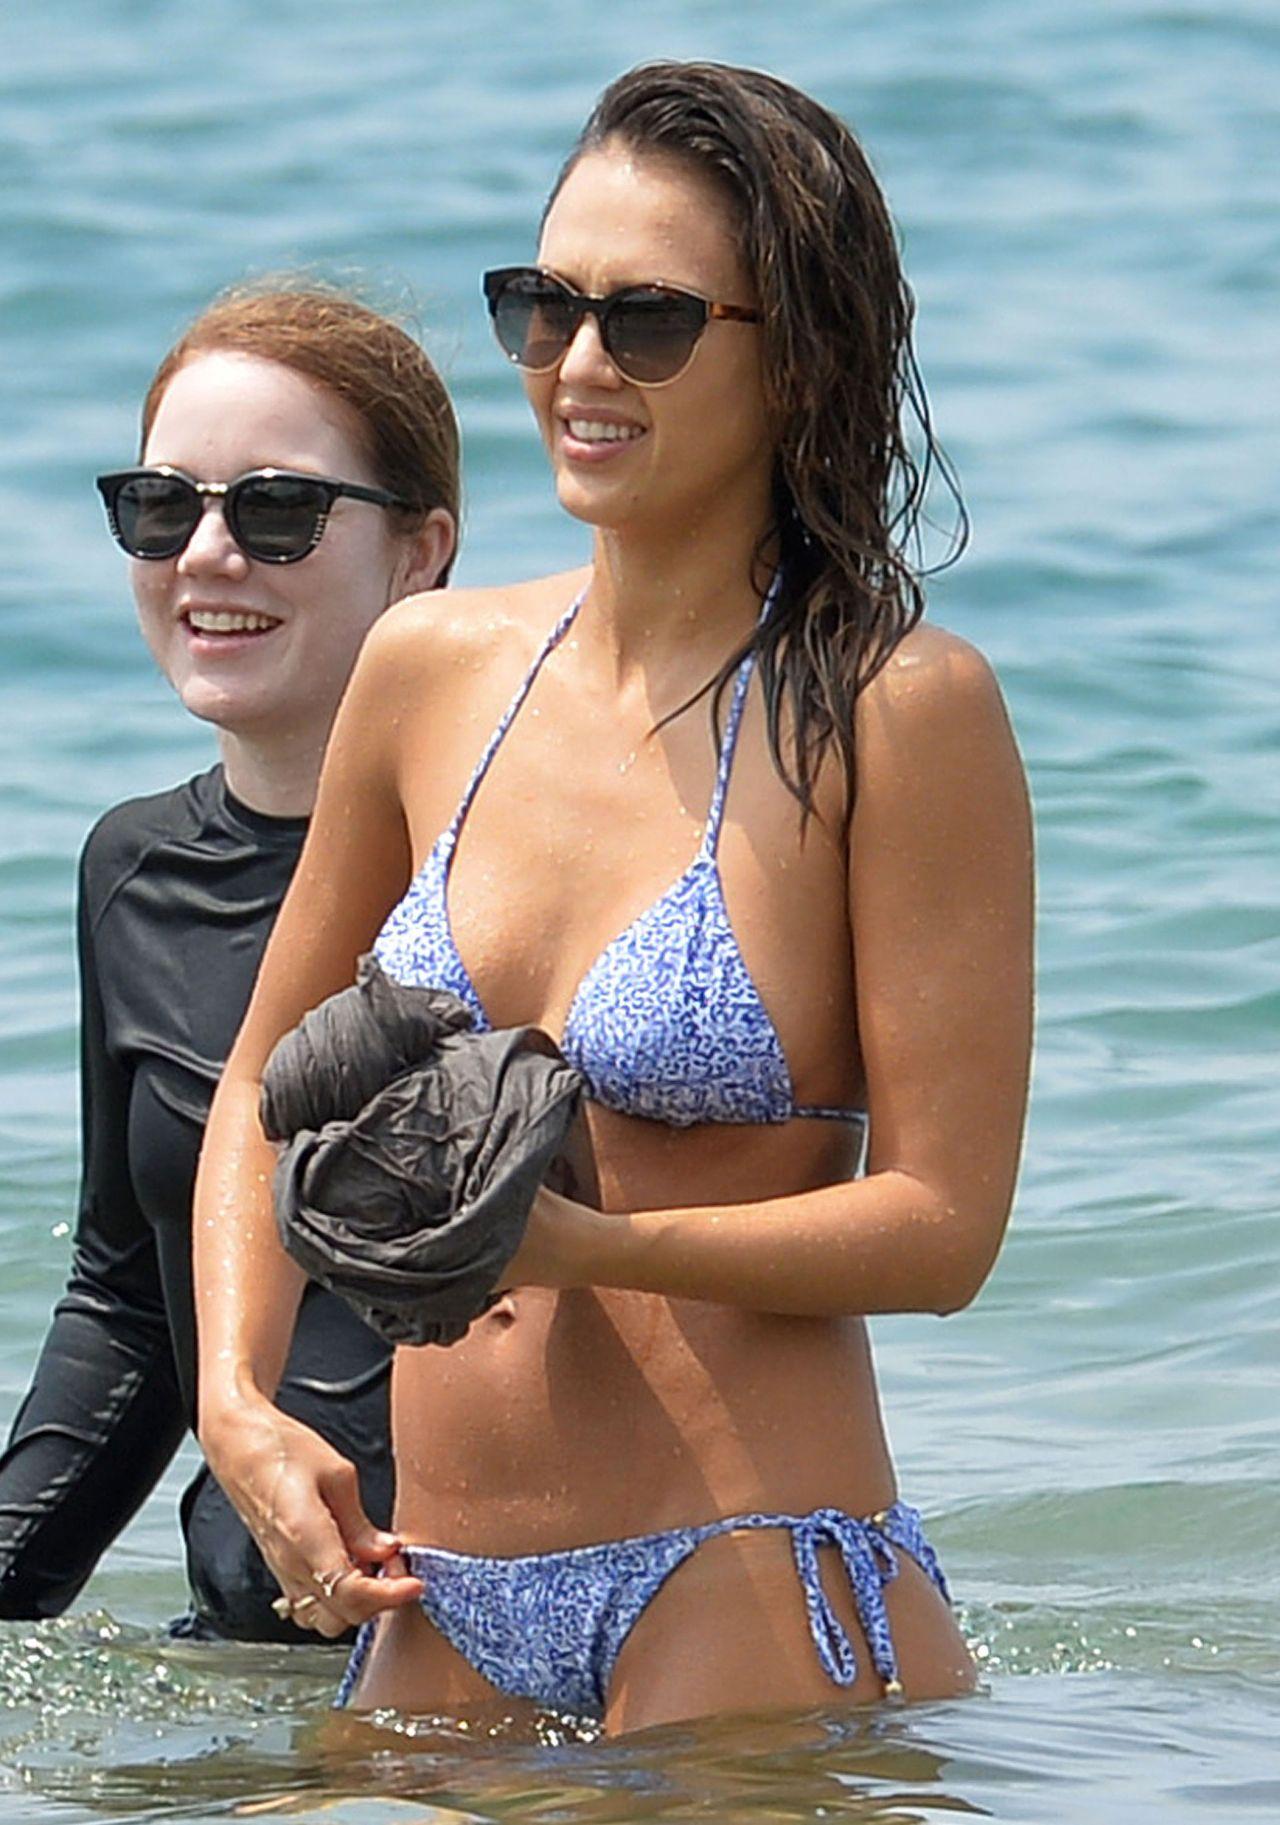 Jessica Alba Hot In Bikini - At The Beach In Hawaii, 3222016-8426